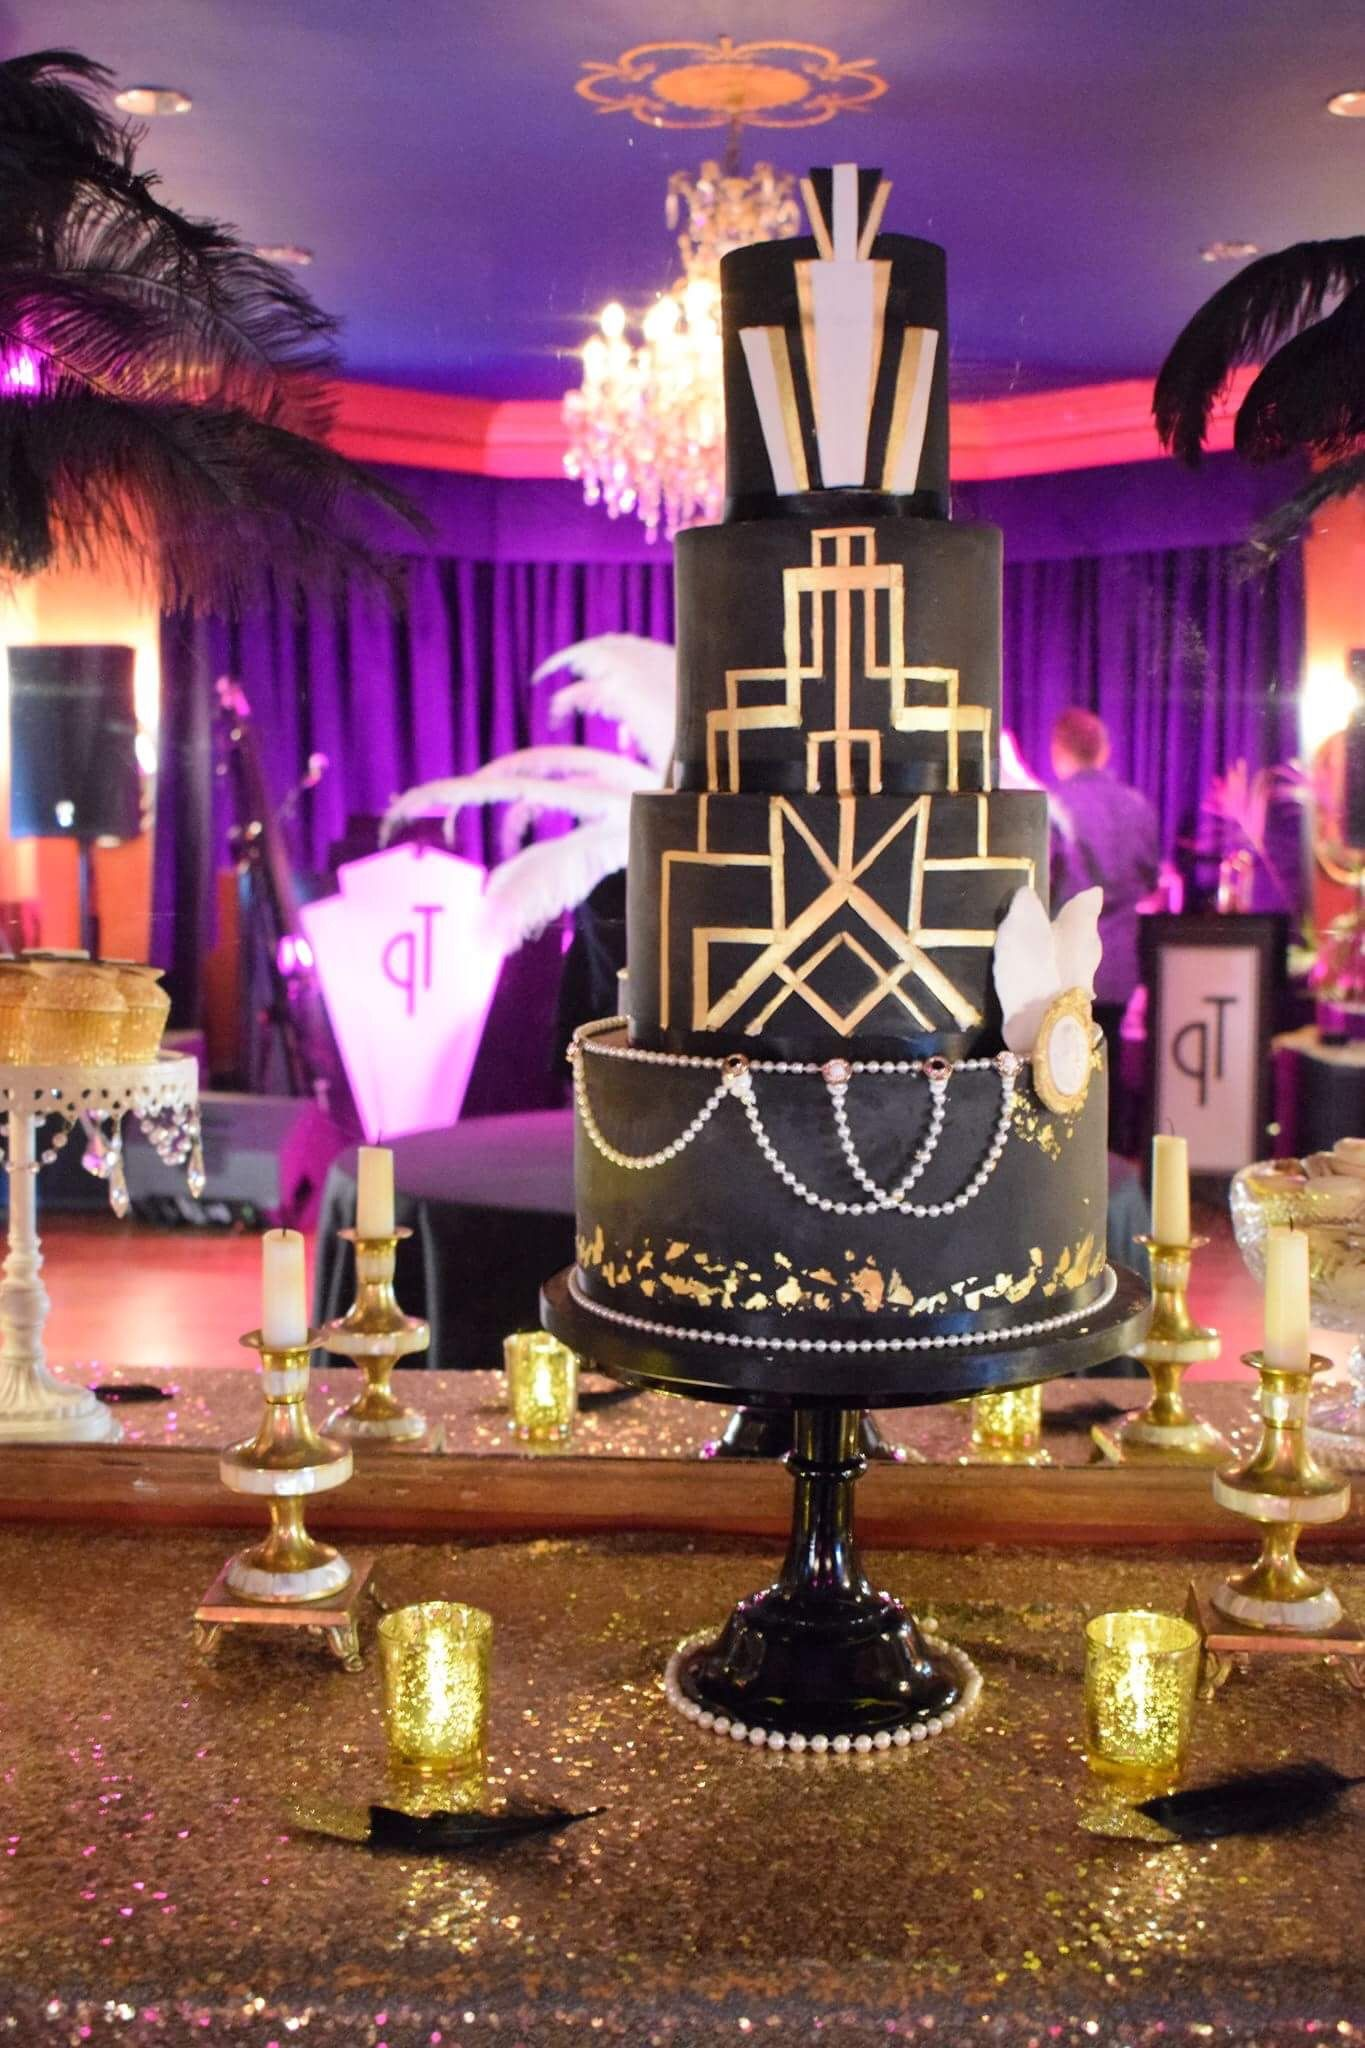 1920s wedding decoration ideas  Gatsby Party by SB Events eventsplanning  Fiesta decor